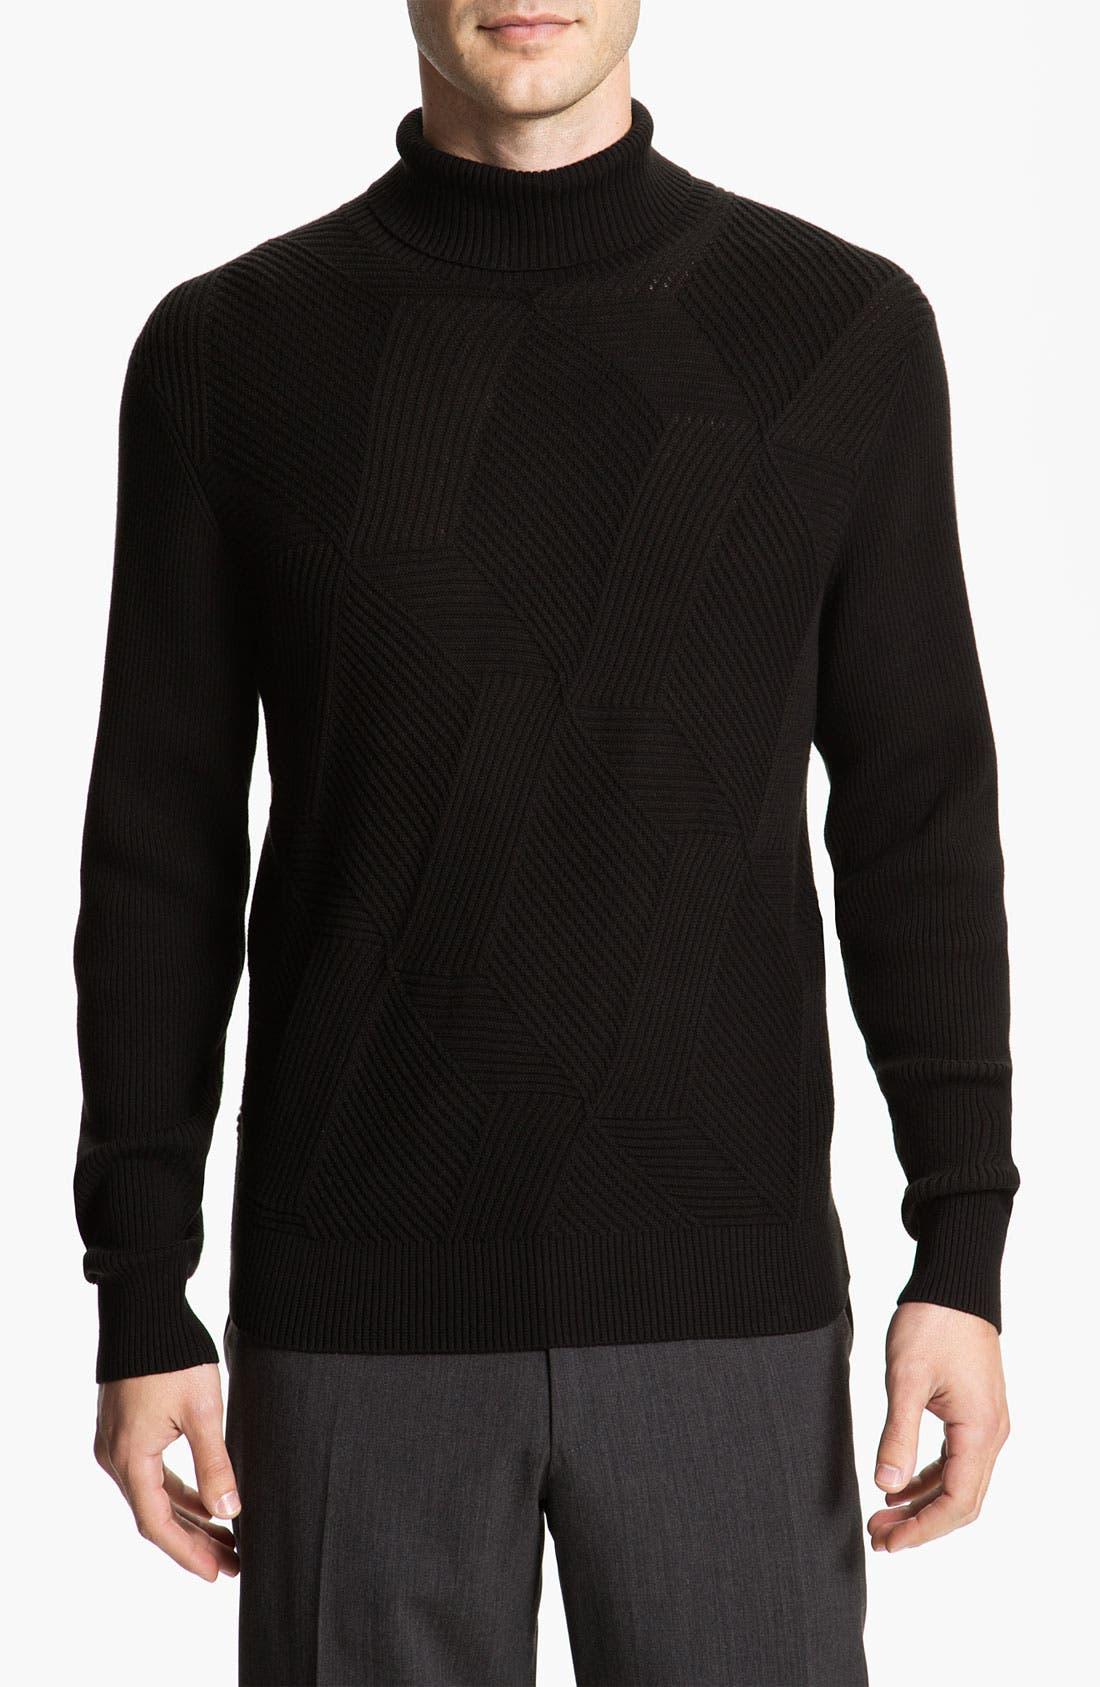 Main Image - Calibrate Cross Ribbed Cotton & Cashmere Turtleneck Sweater